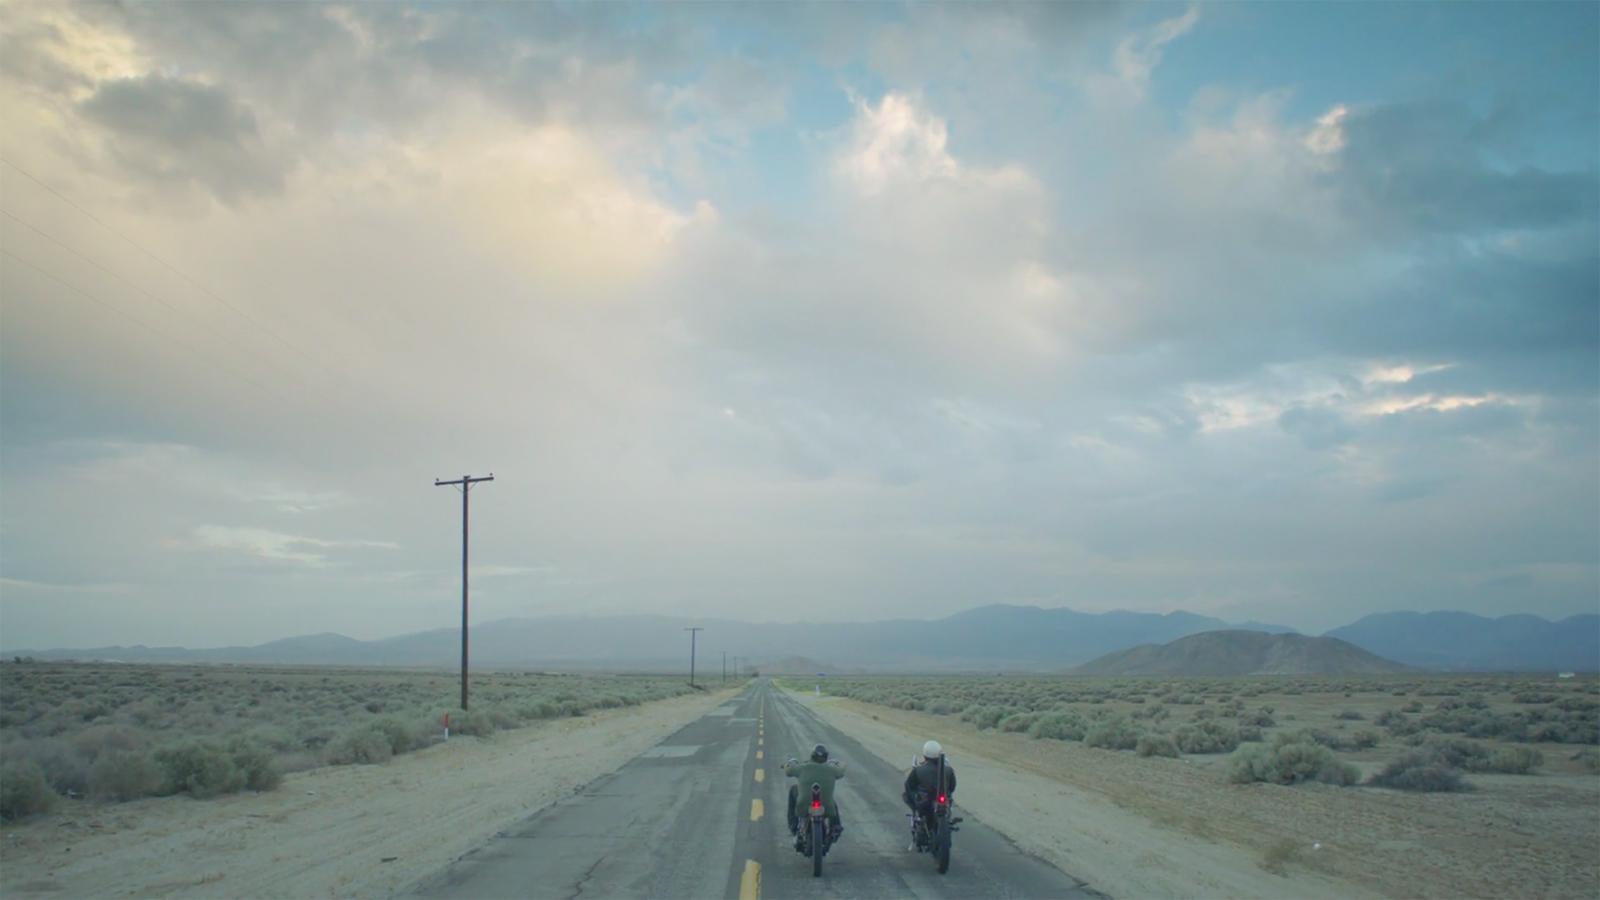 Landscape_riders.jpg.jpg